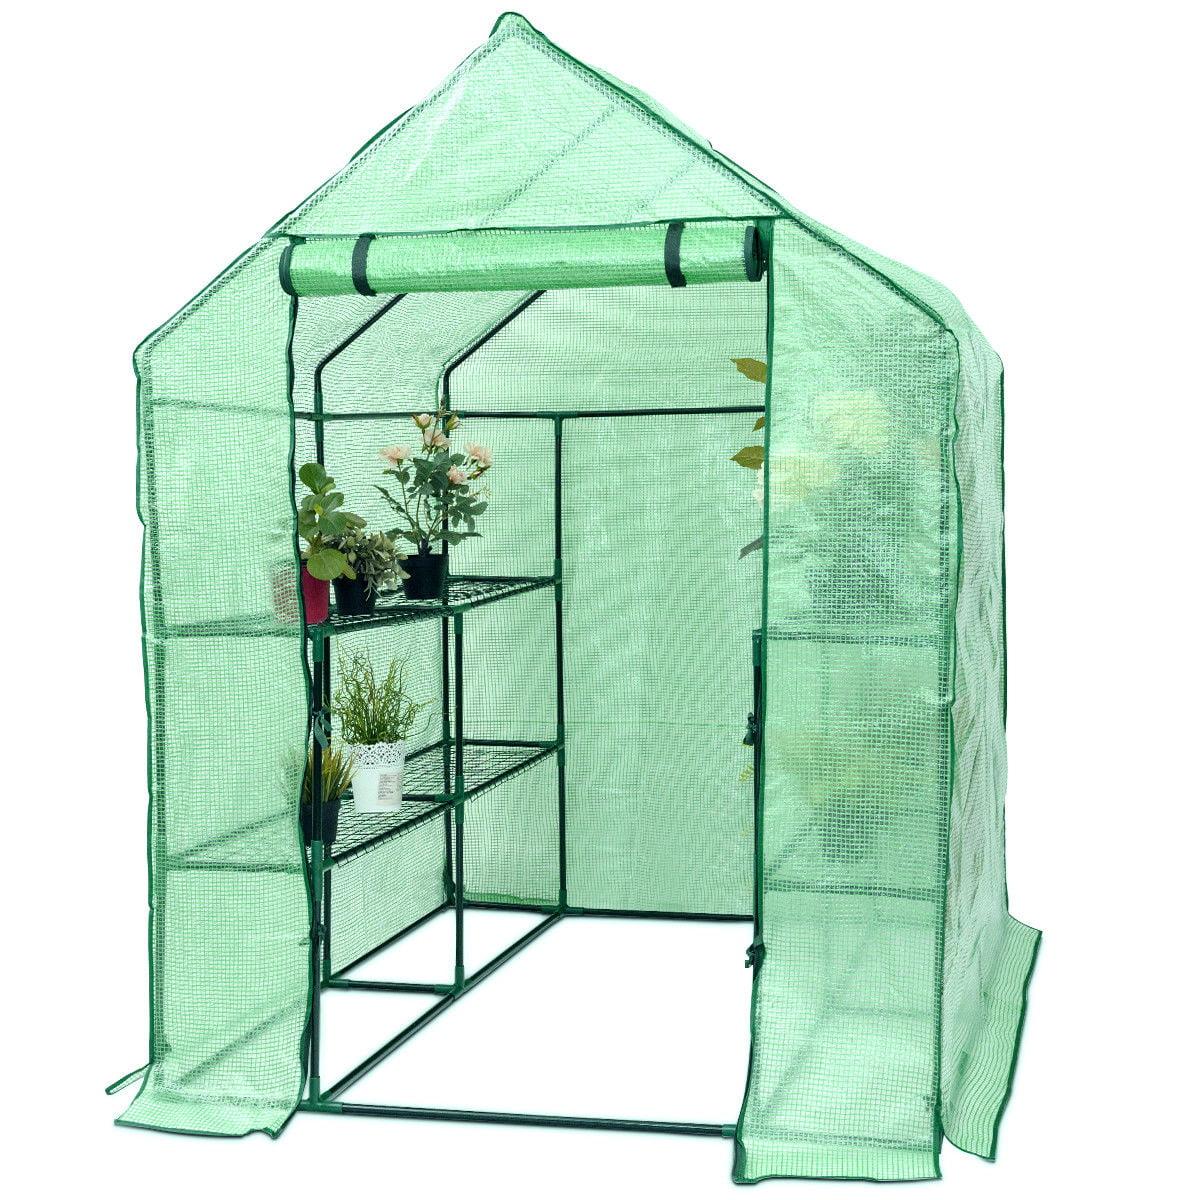 Costway Portable Mini Walk In Outdoor 2 Tier 8 Shelves Greenhouse